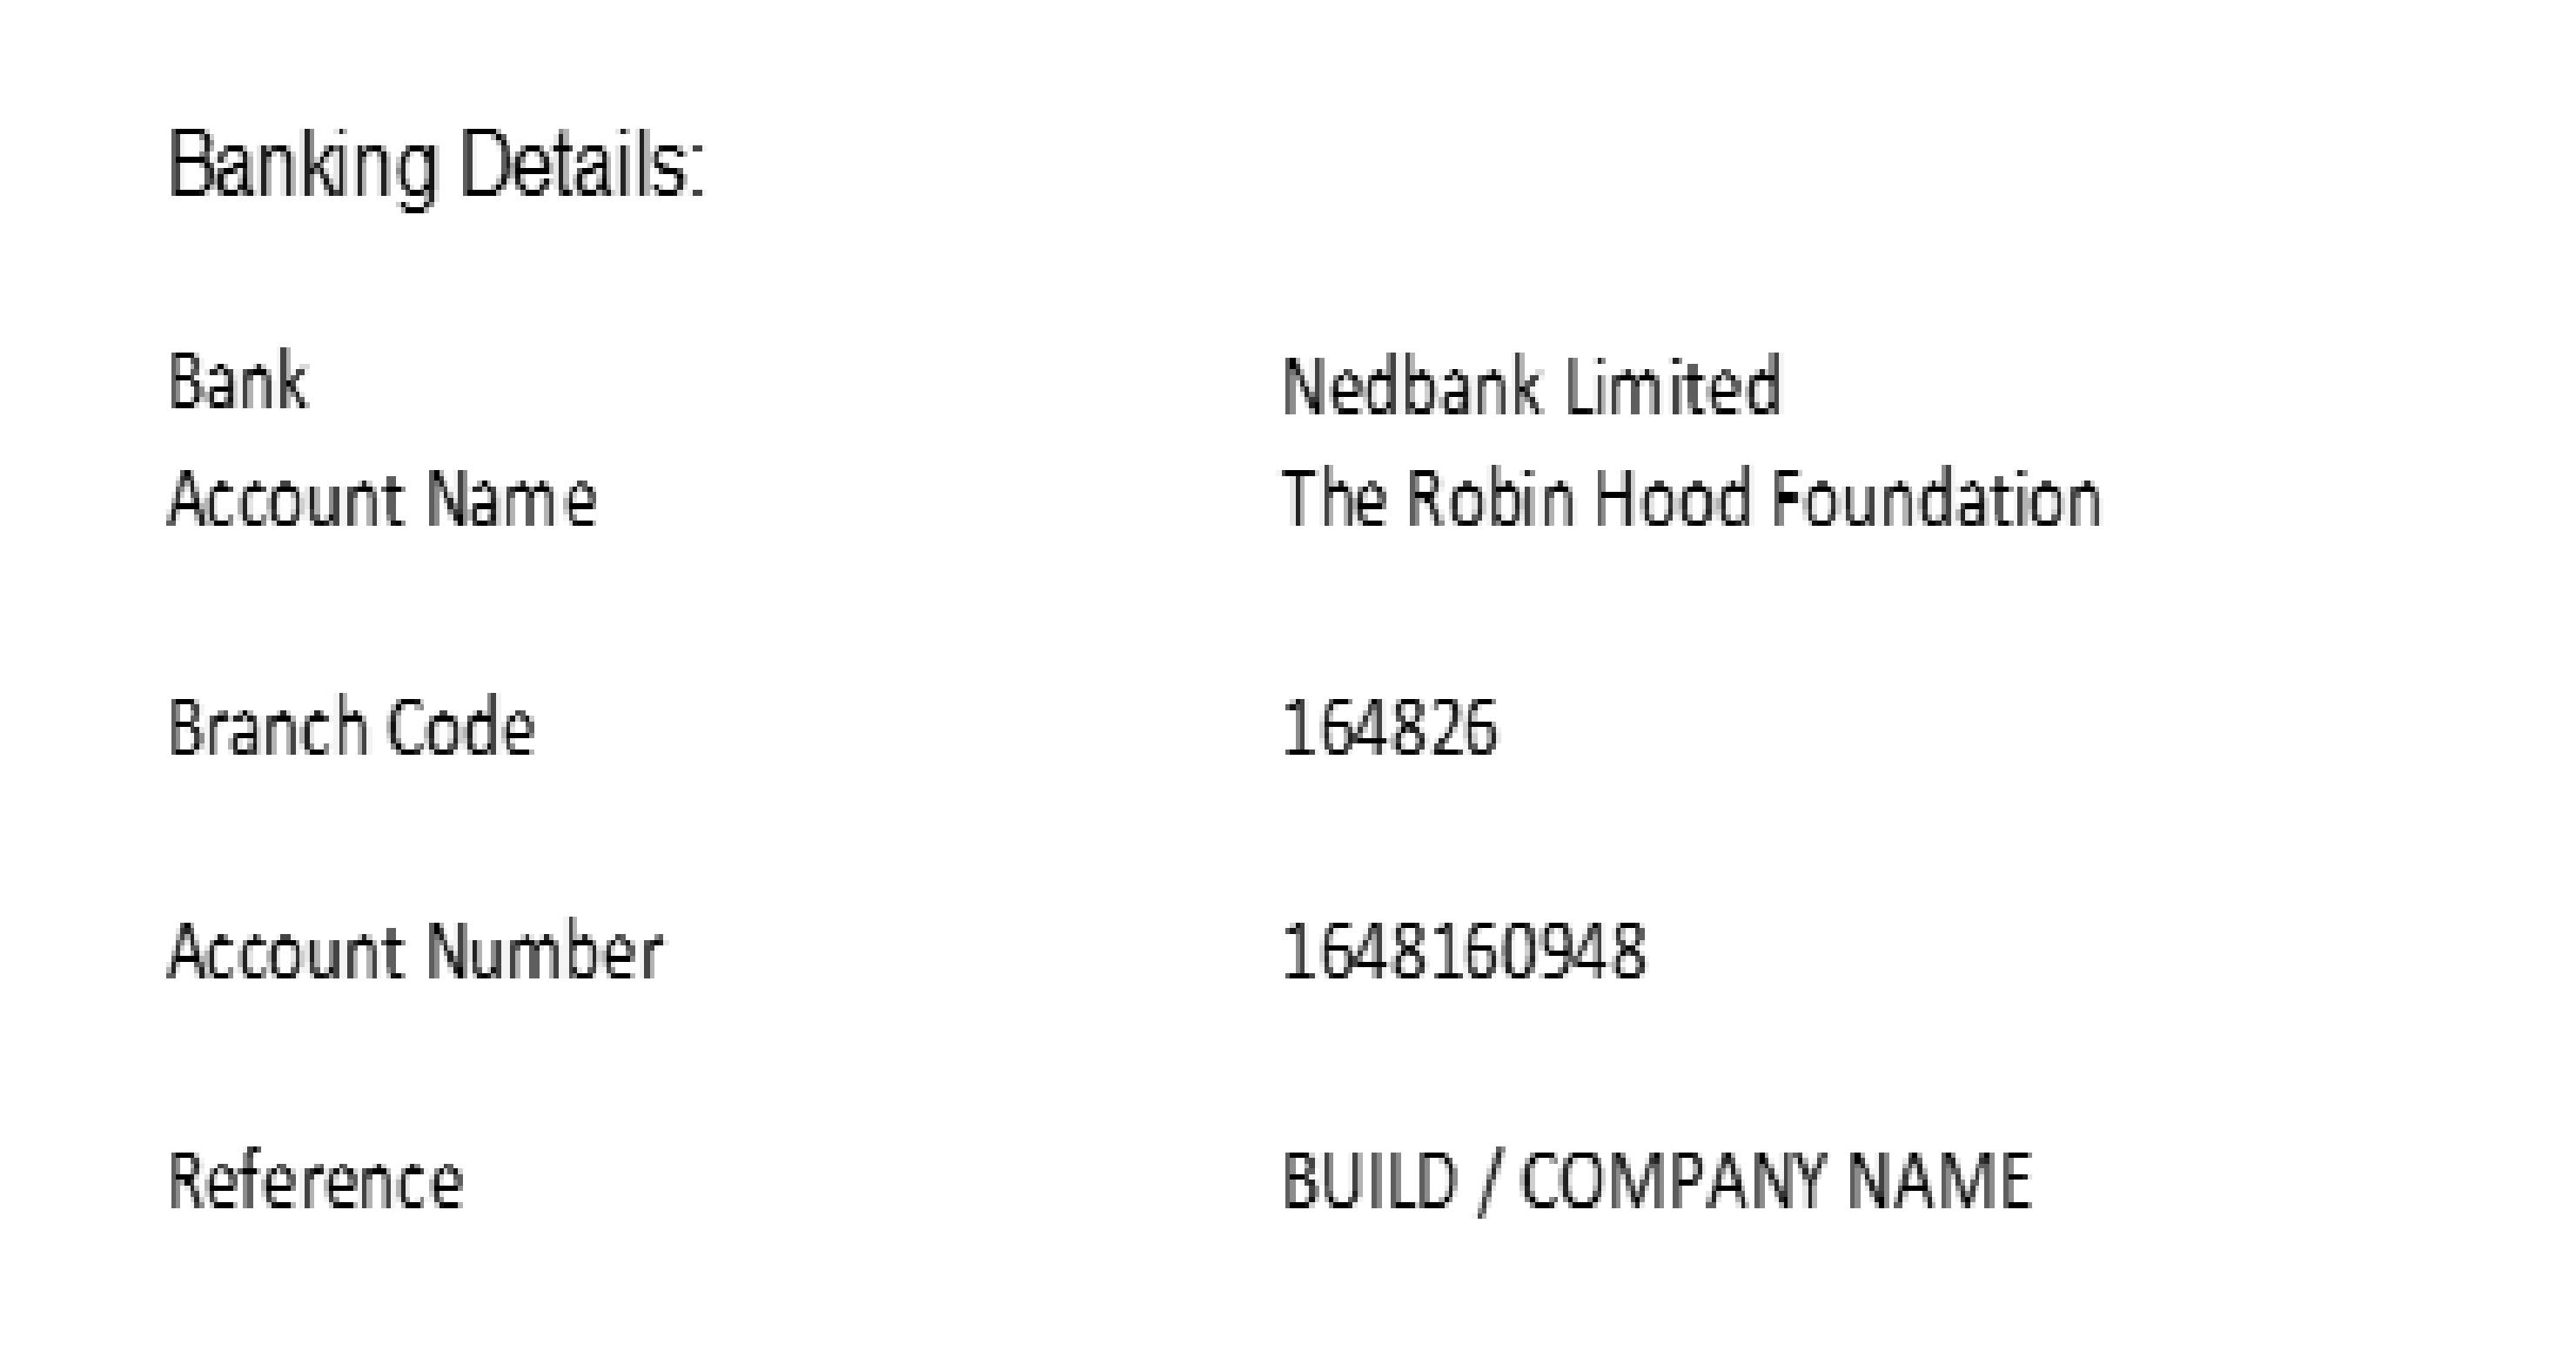 banking details for robin hood